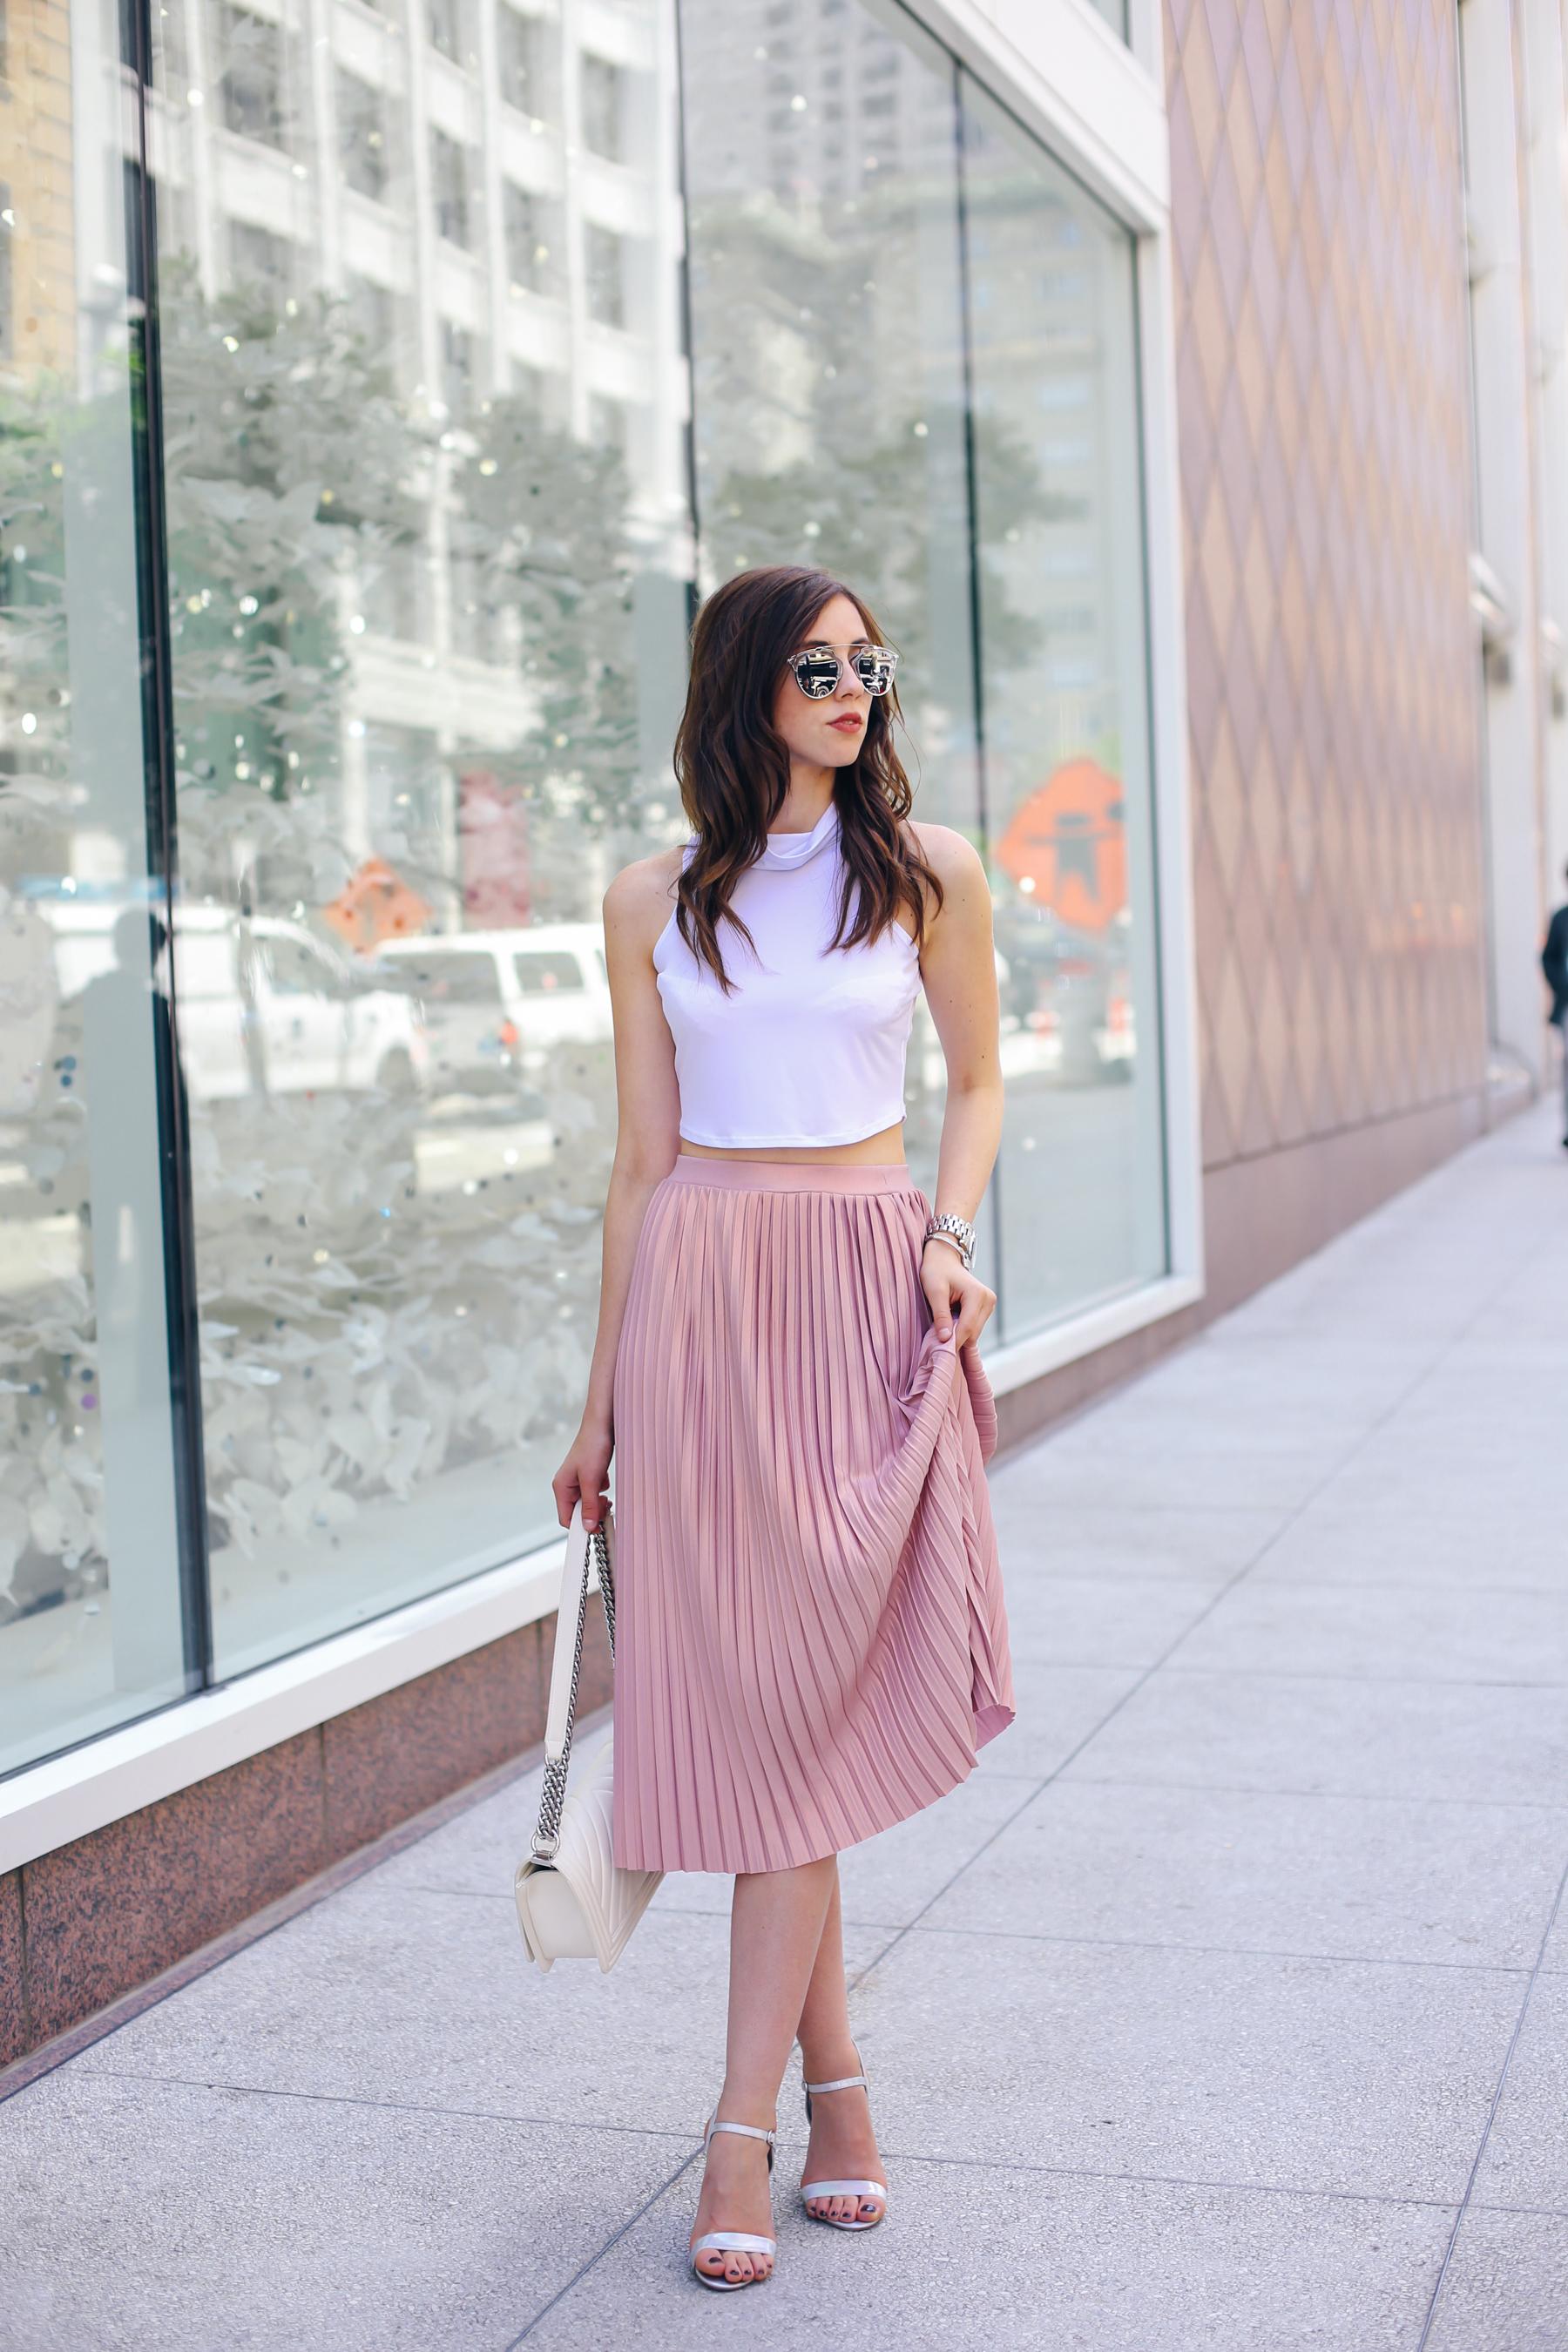 Barbora-Ondracova-FashioninmySoul-Fashion-Blogger-Photography-RyanbyRyanChua-7605